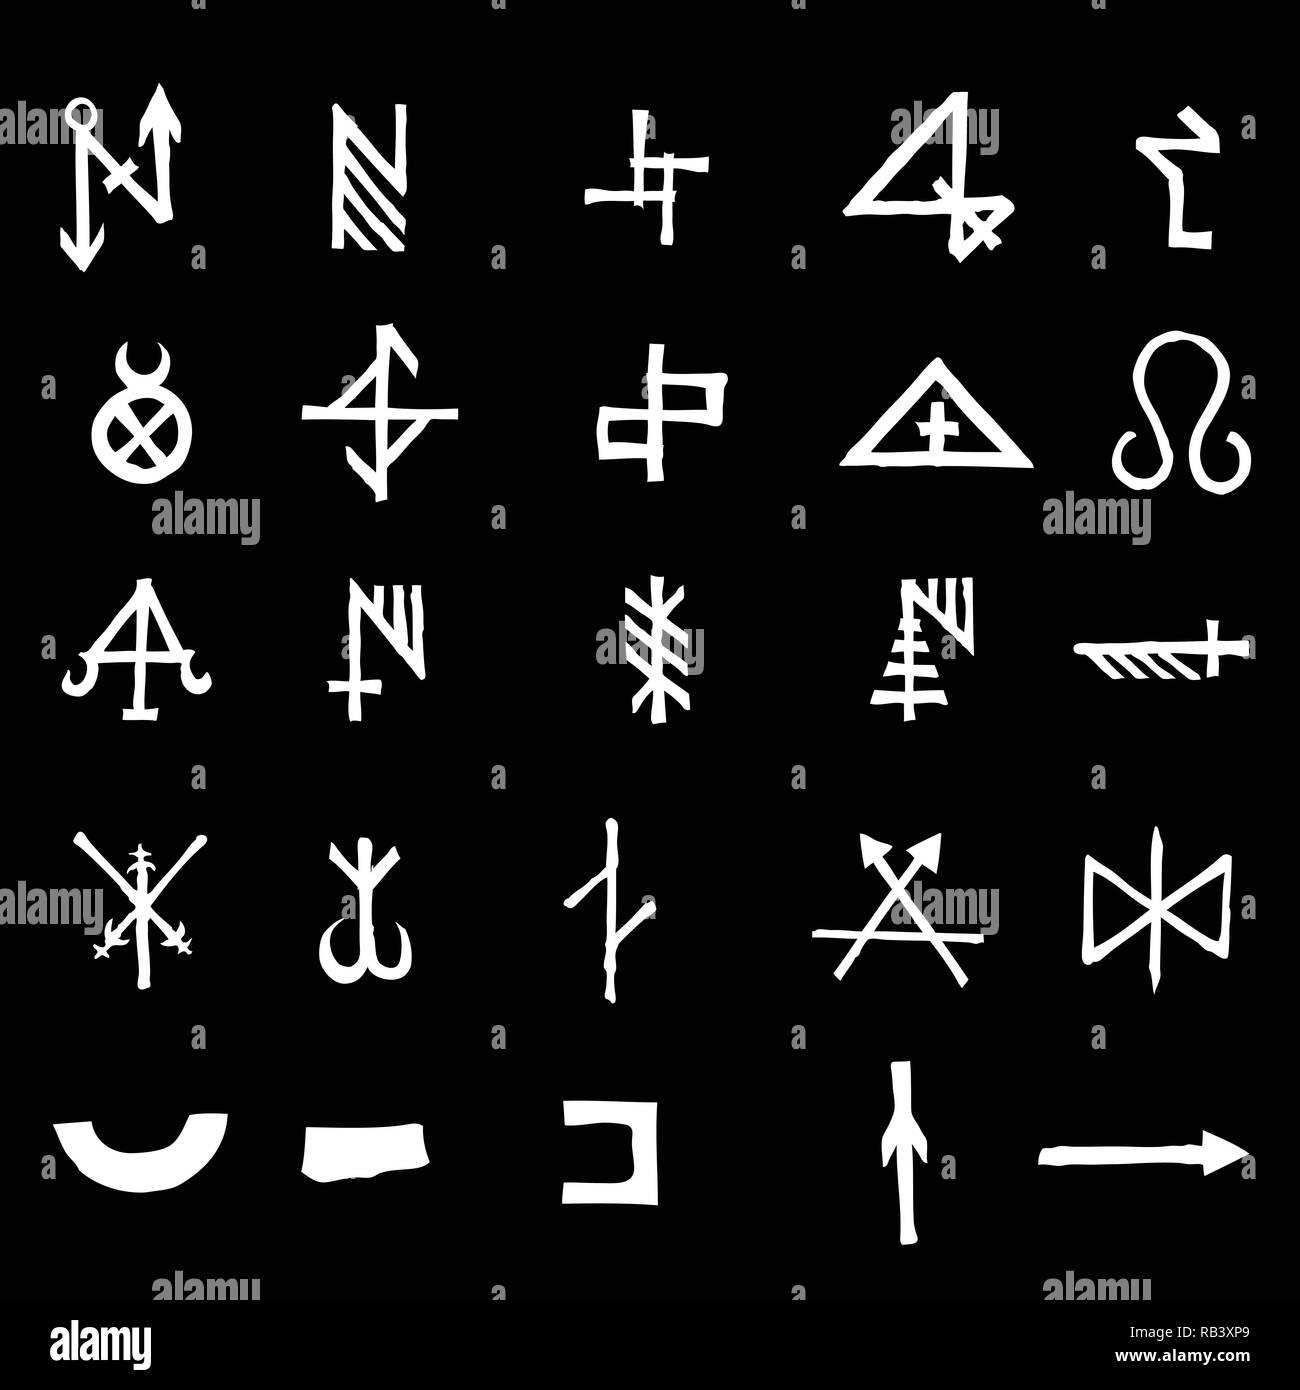 Occult Symbol Stock Photos & Occult Symbol Stock Images - Alamy